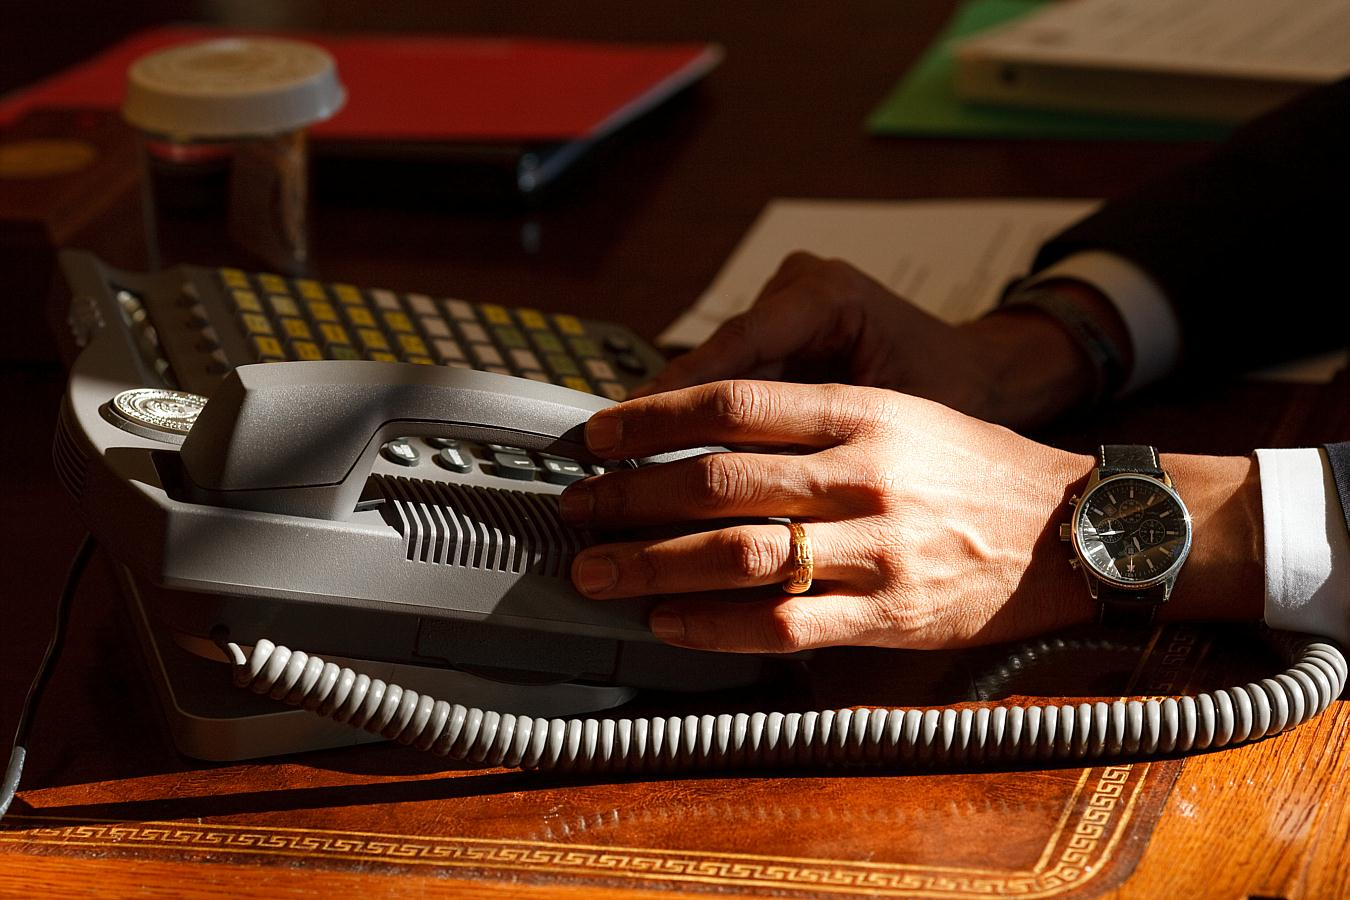 image fileobama oval officejpg